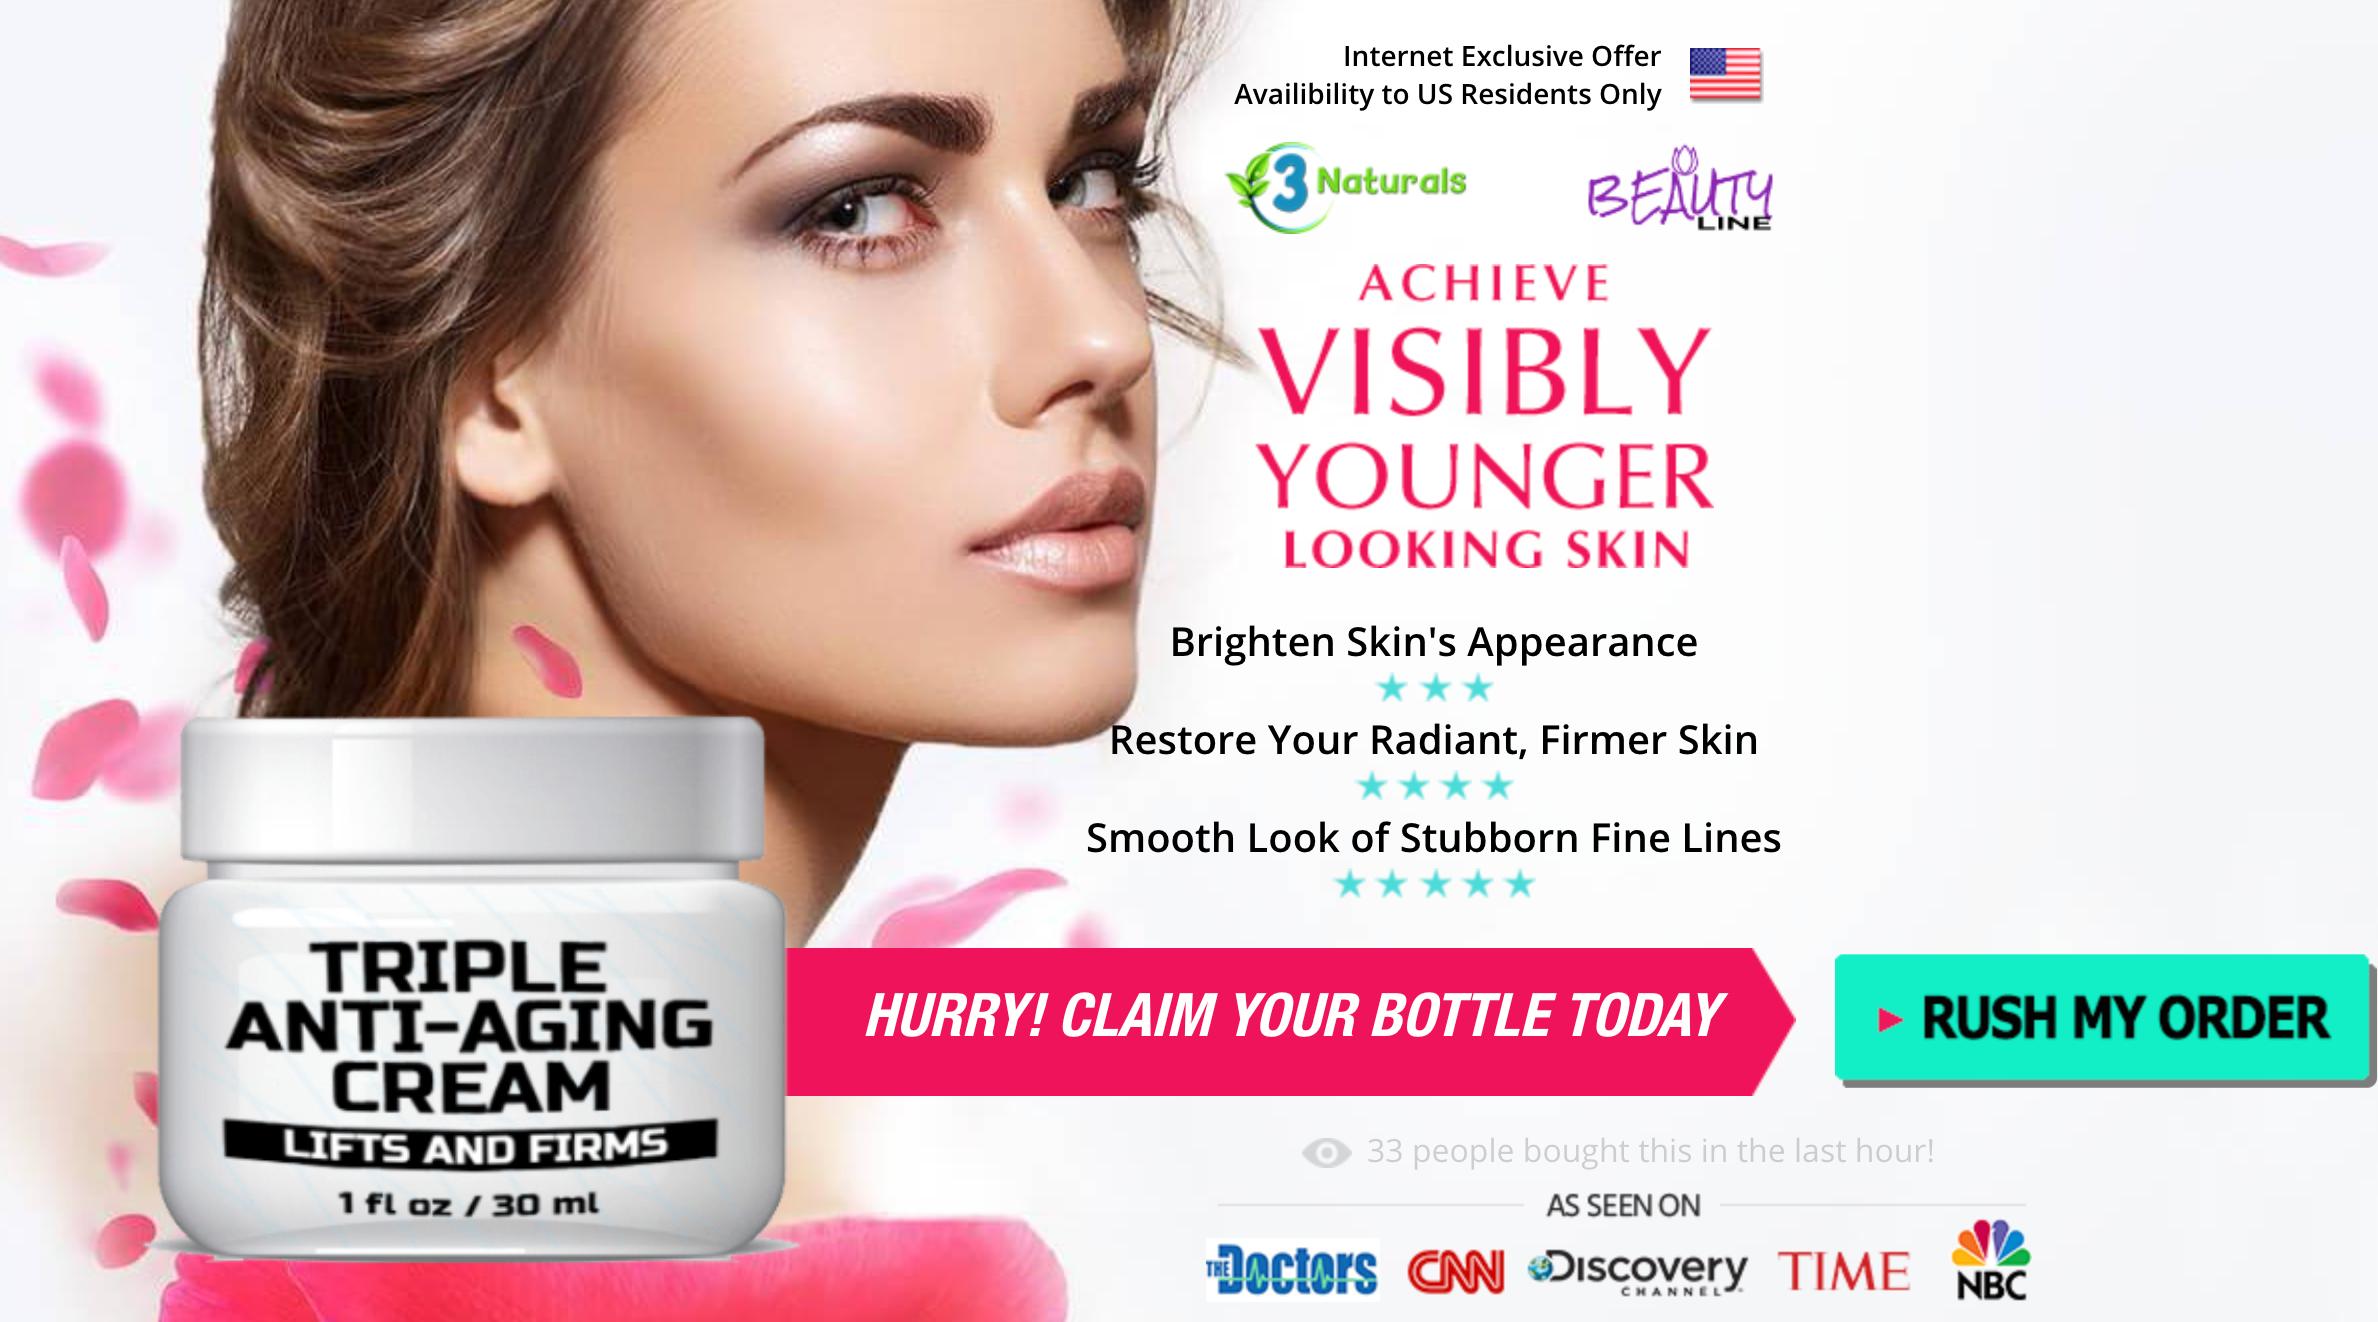 Triple-Anti-Aging Cream